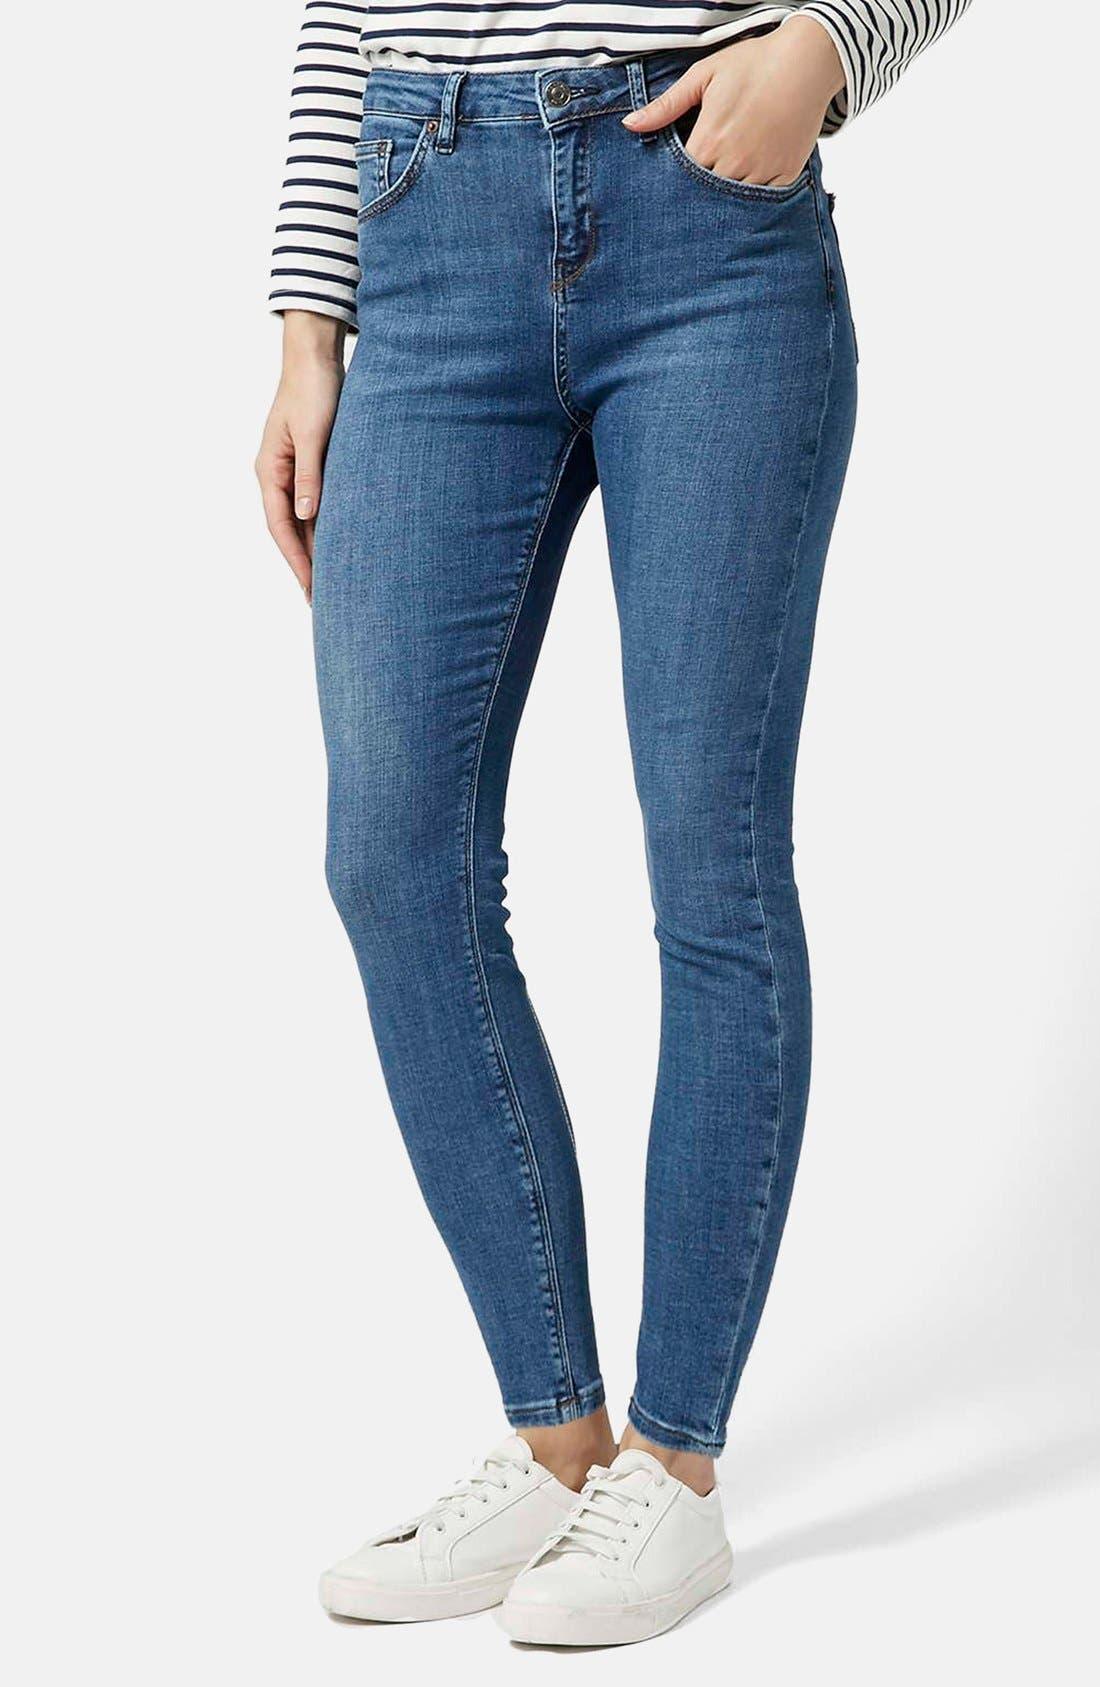 Main Image - Topshop Moto 'Cain' High Rise Ankle Jeans (Blue) (Short)